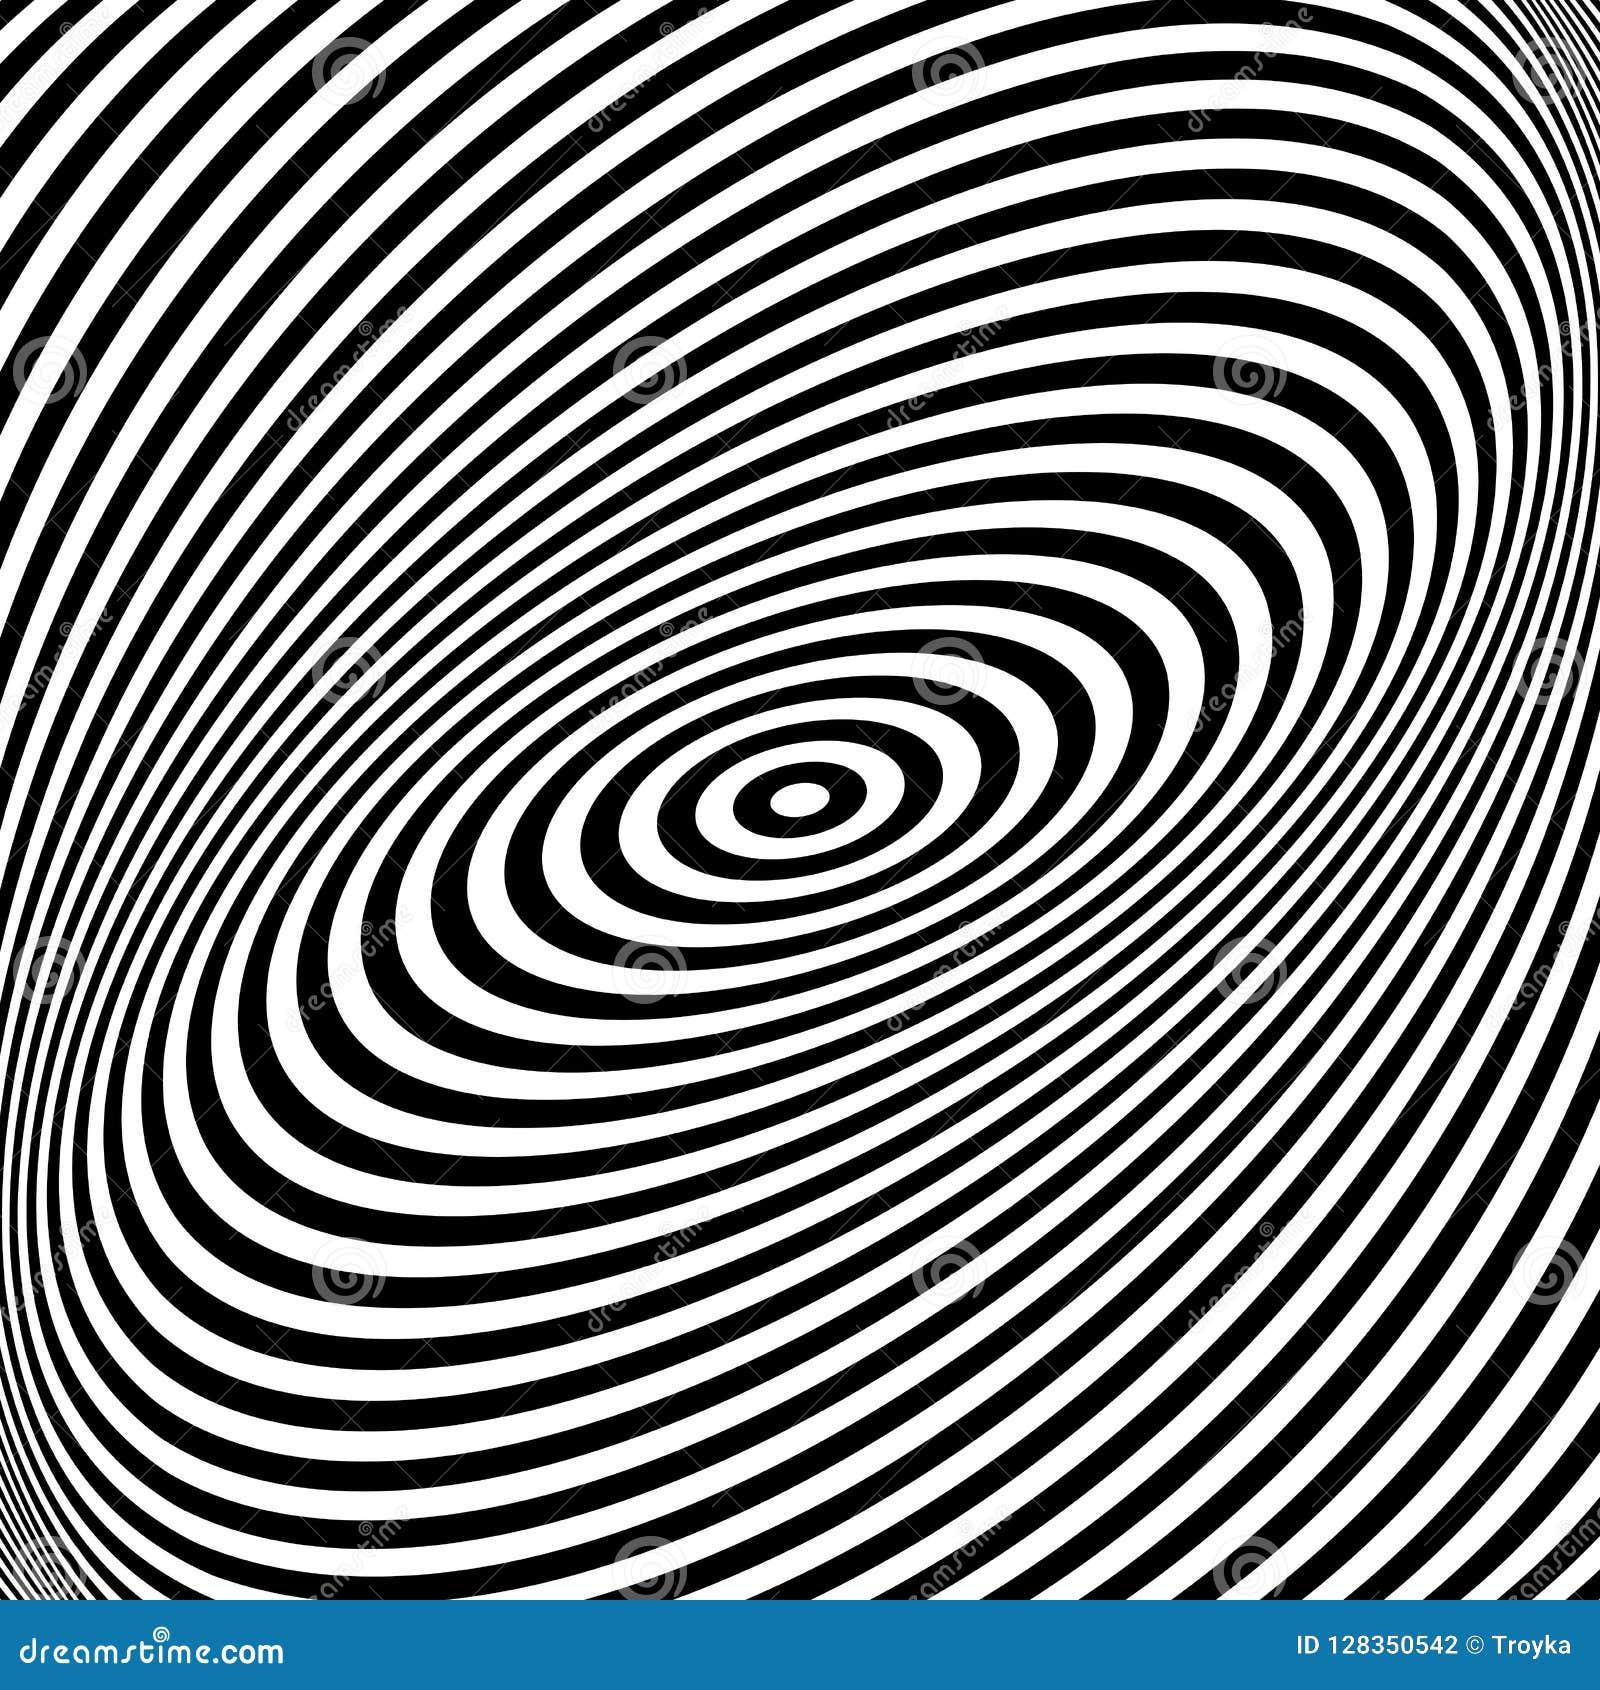 Rotation torsion movement illusion.